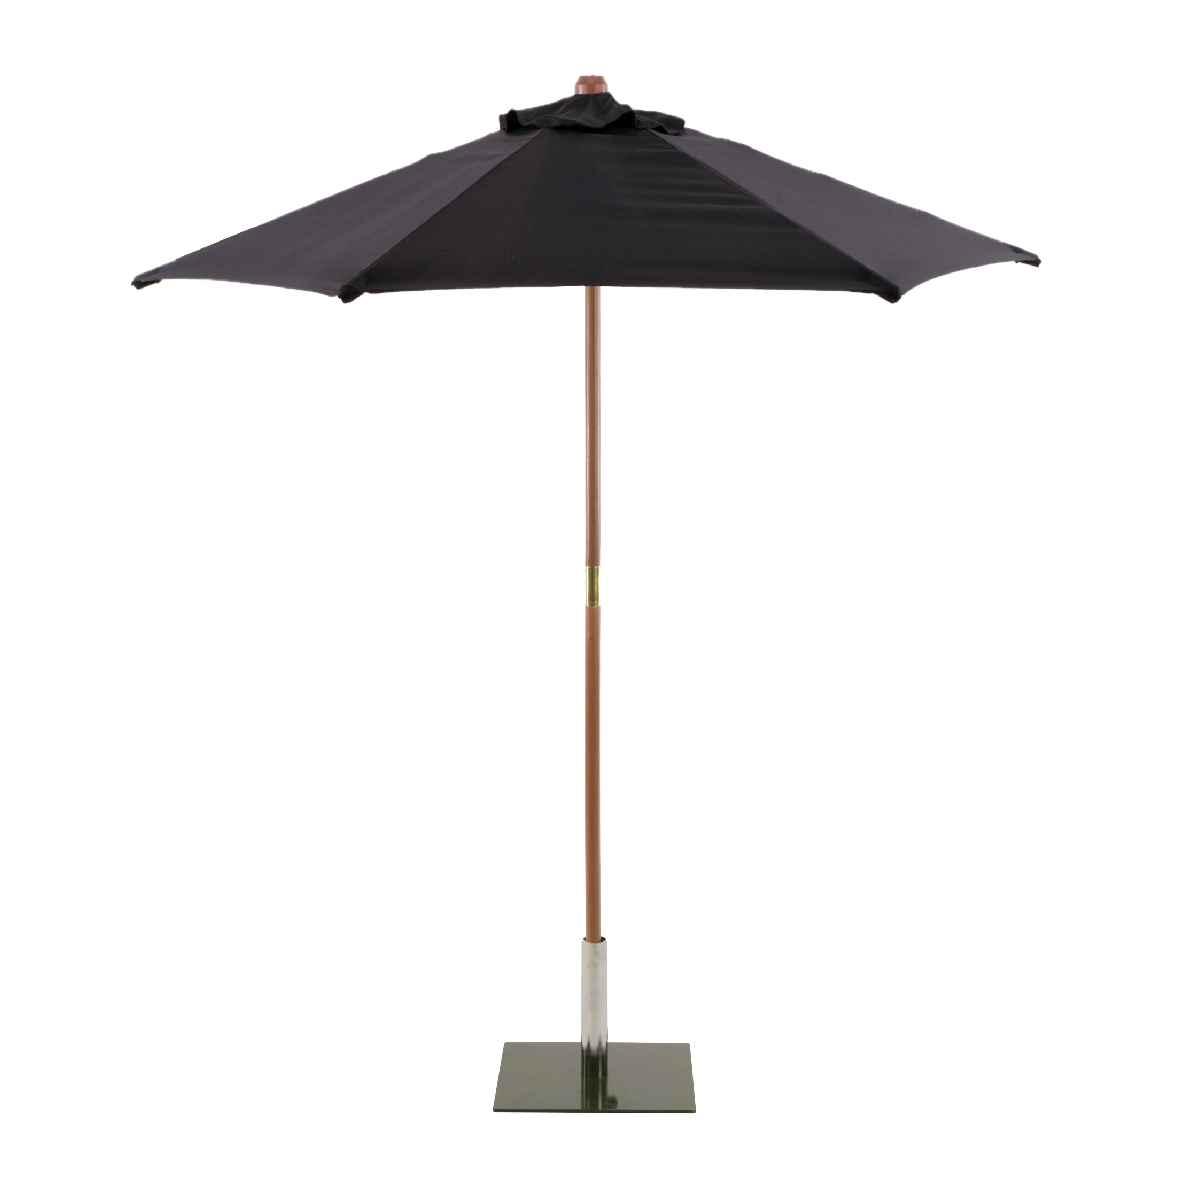 Sturdi Round 2.5m Wood Parasol (base not included) - Black